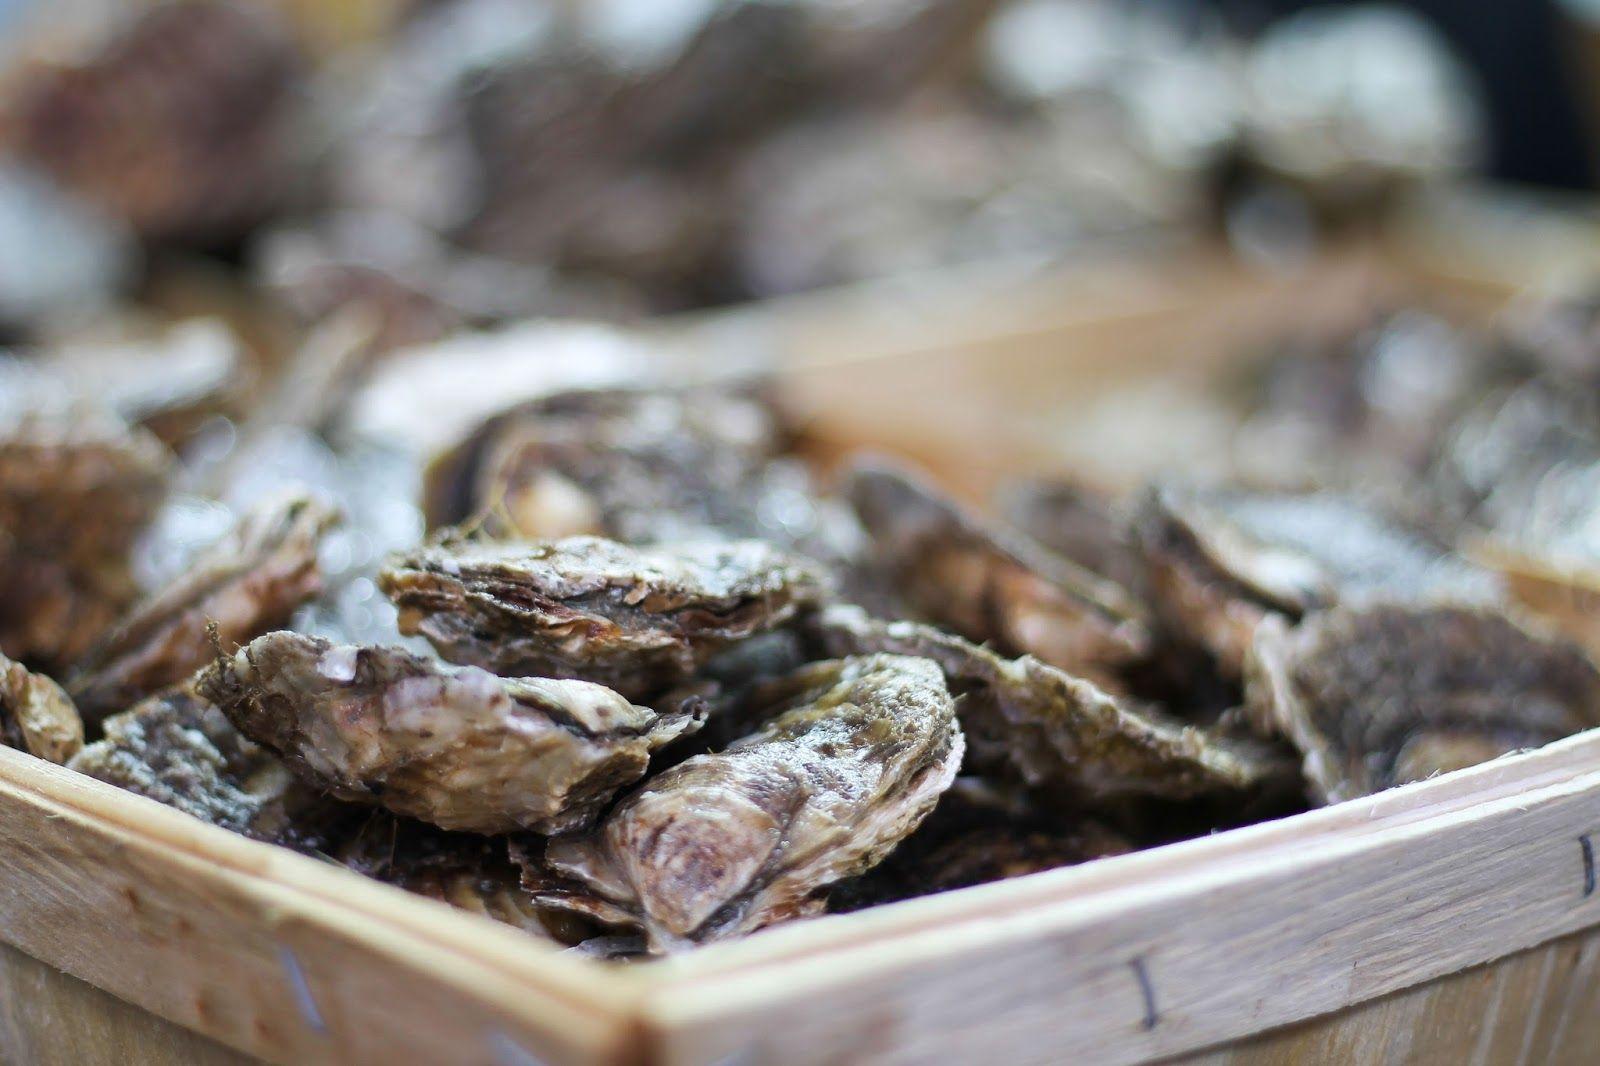 London Travel für Foodies: Borough Market, Austern - oysters.